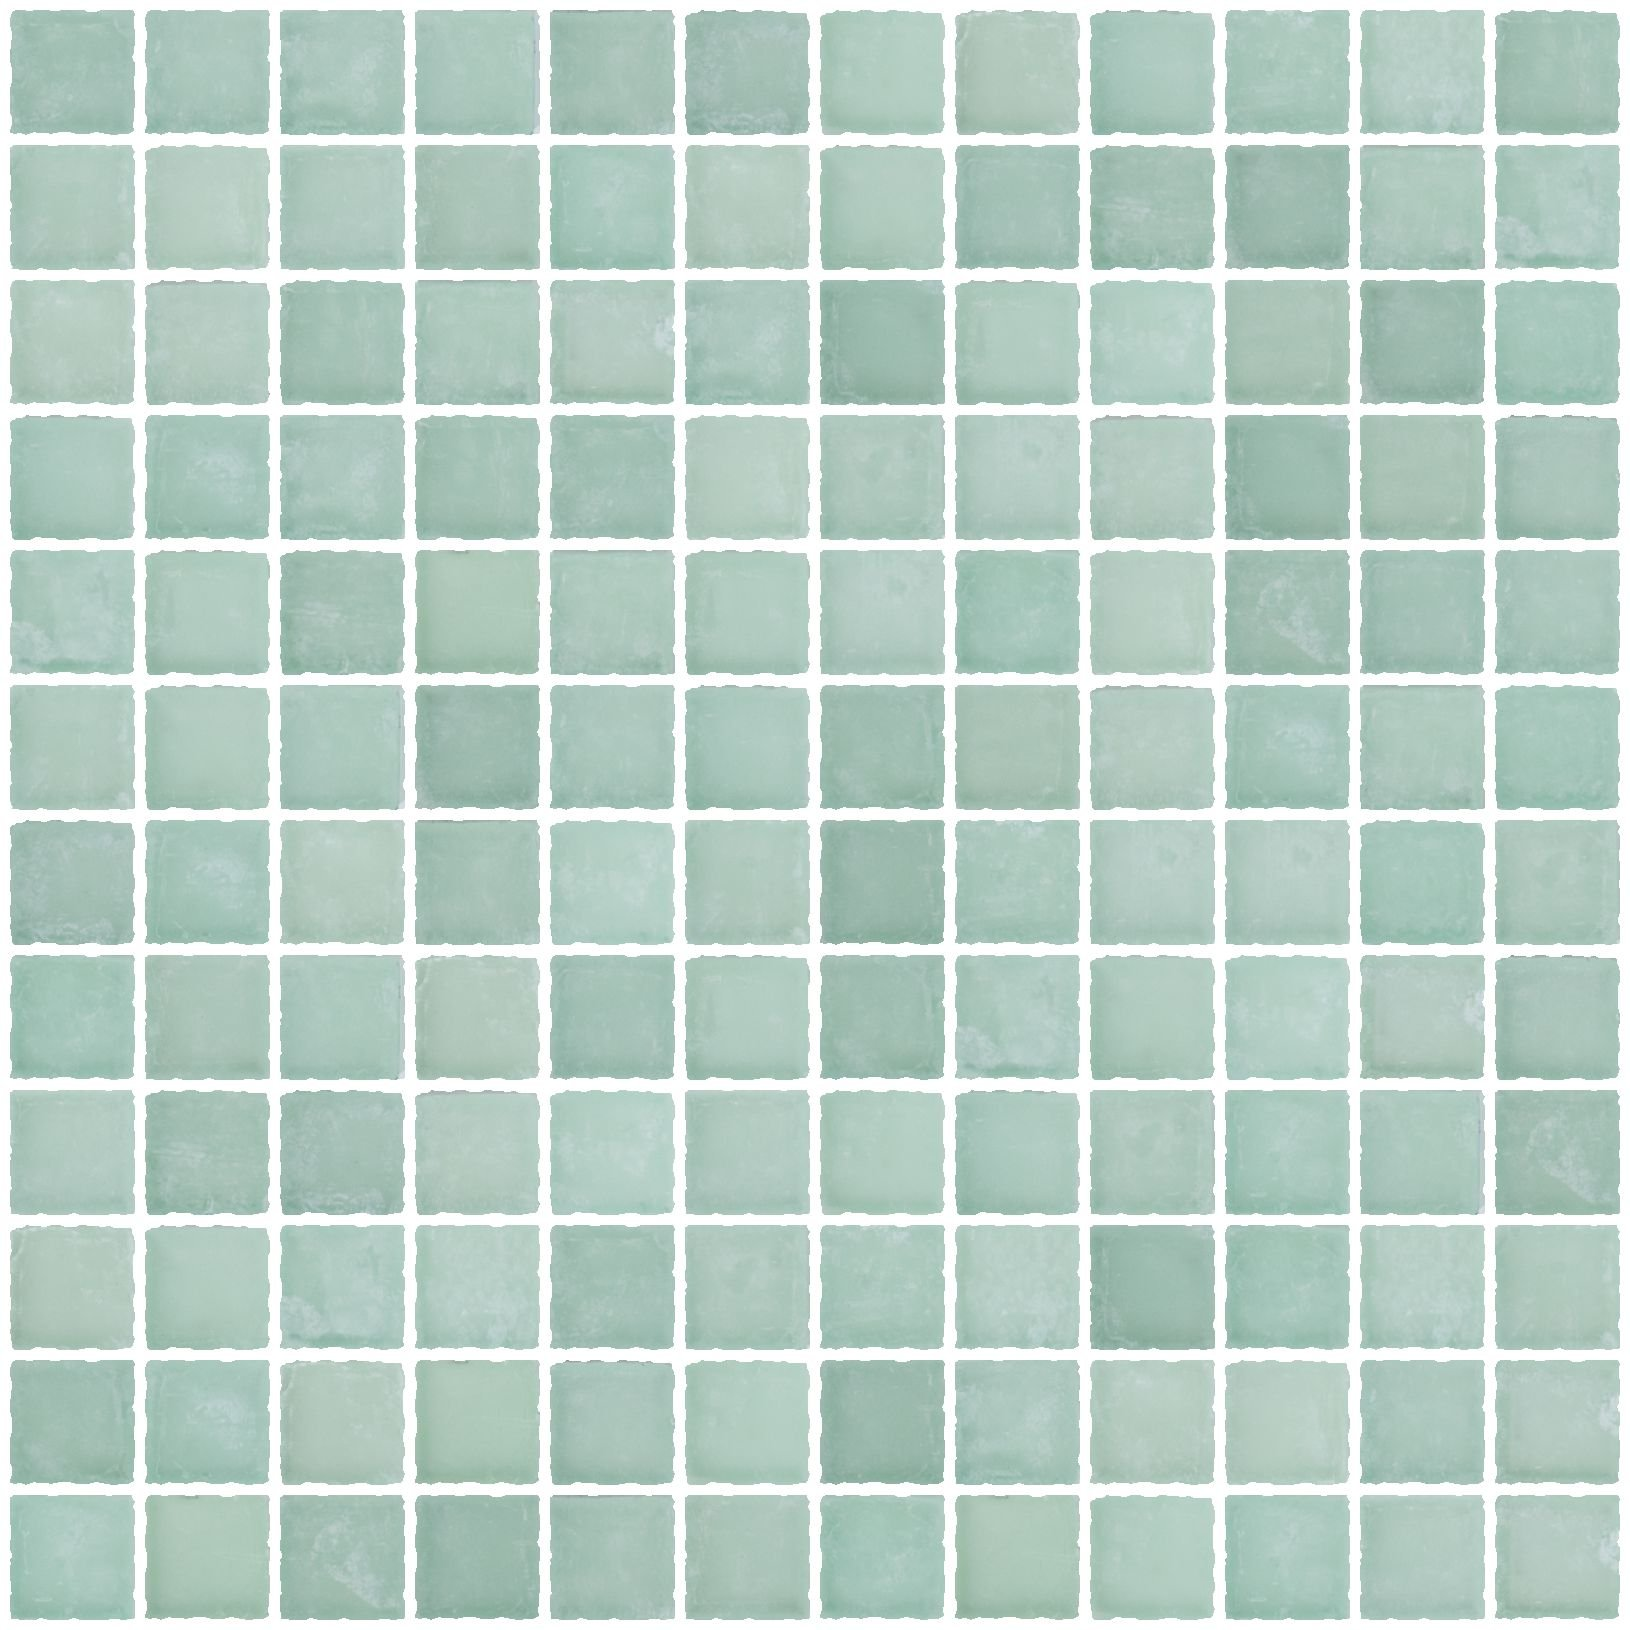 Susan Jablon Mosaics - 1 Inch Matte Sea Green Glass Tile